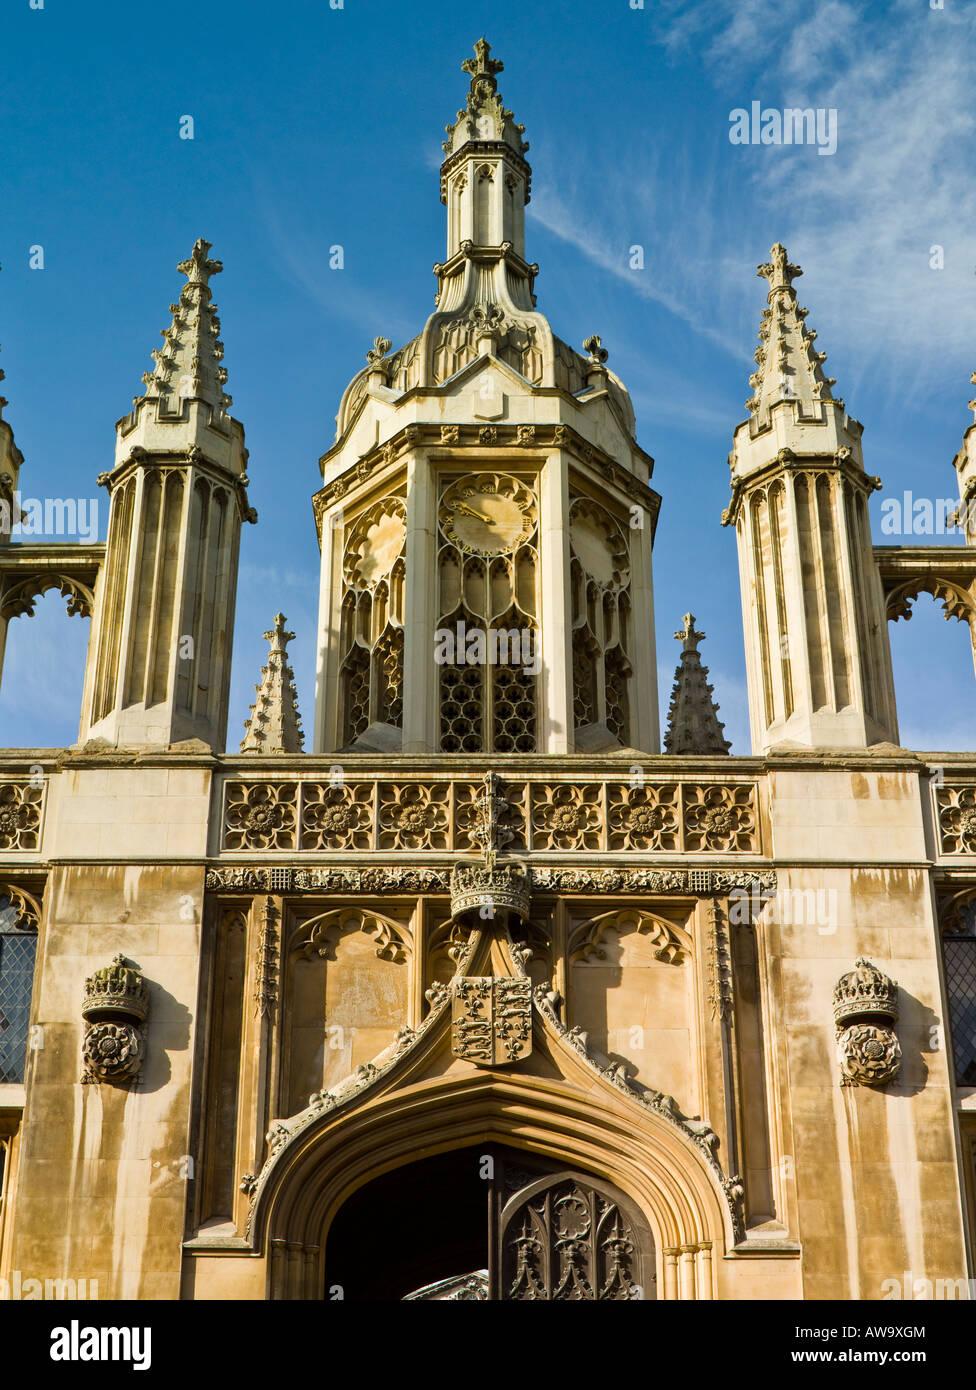 The Gatehouse, King's College, Cambridge - Stock Image